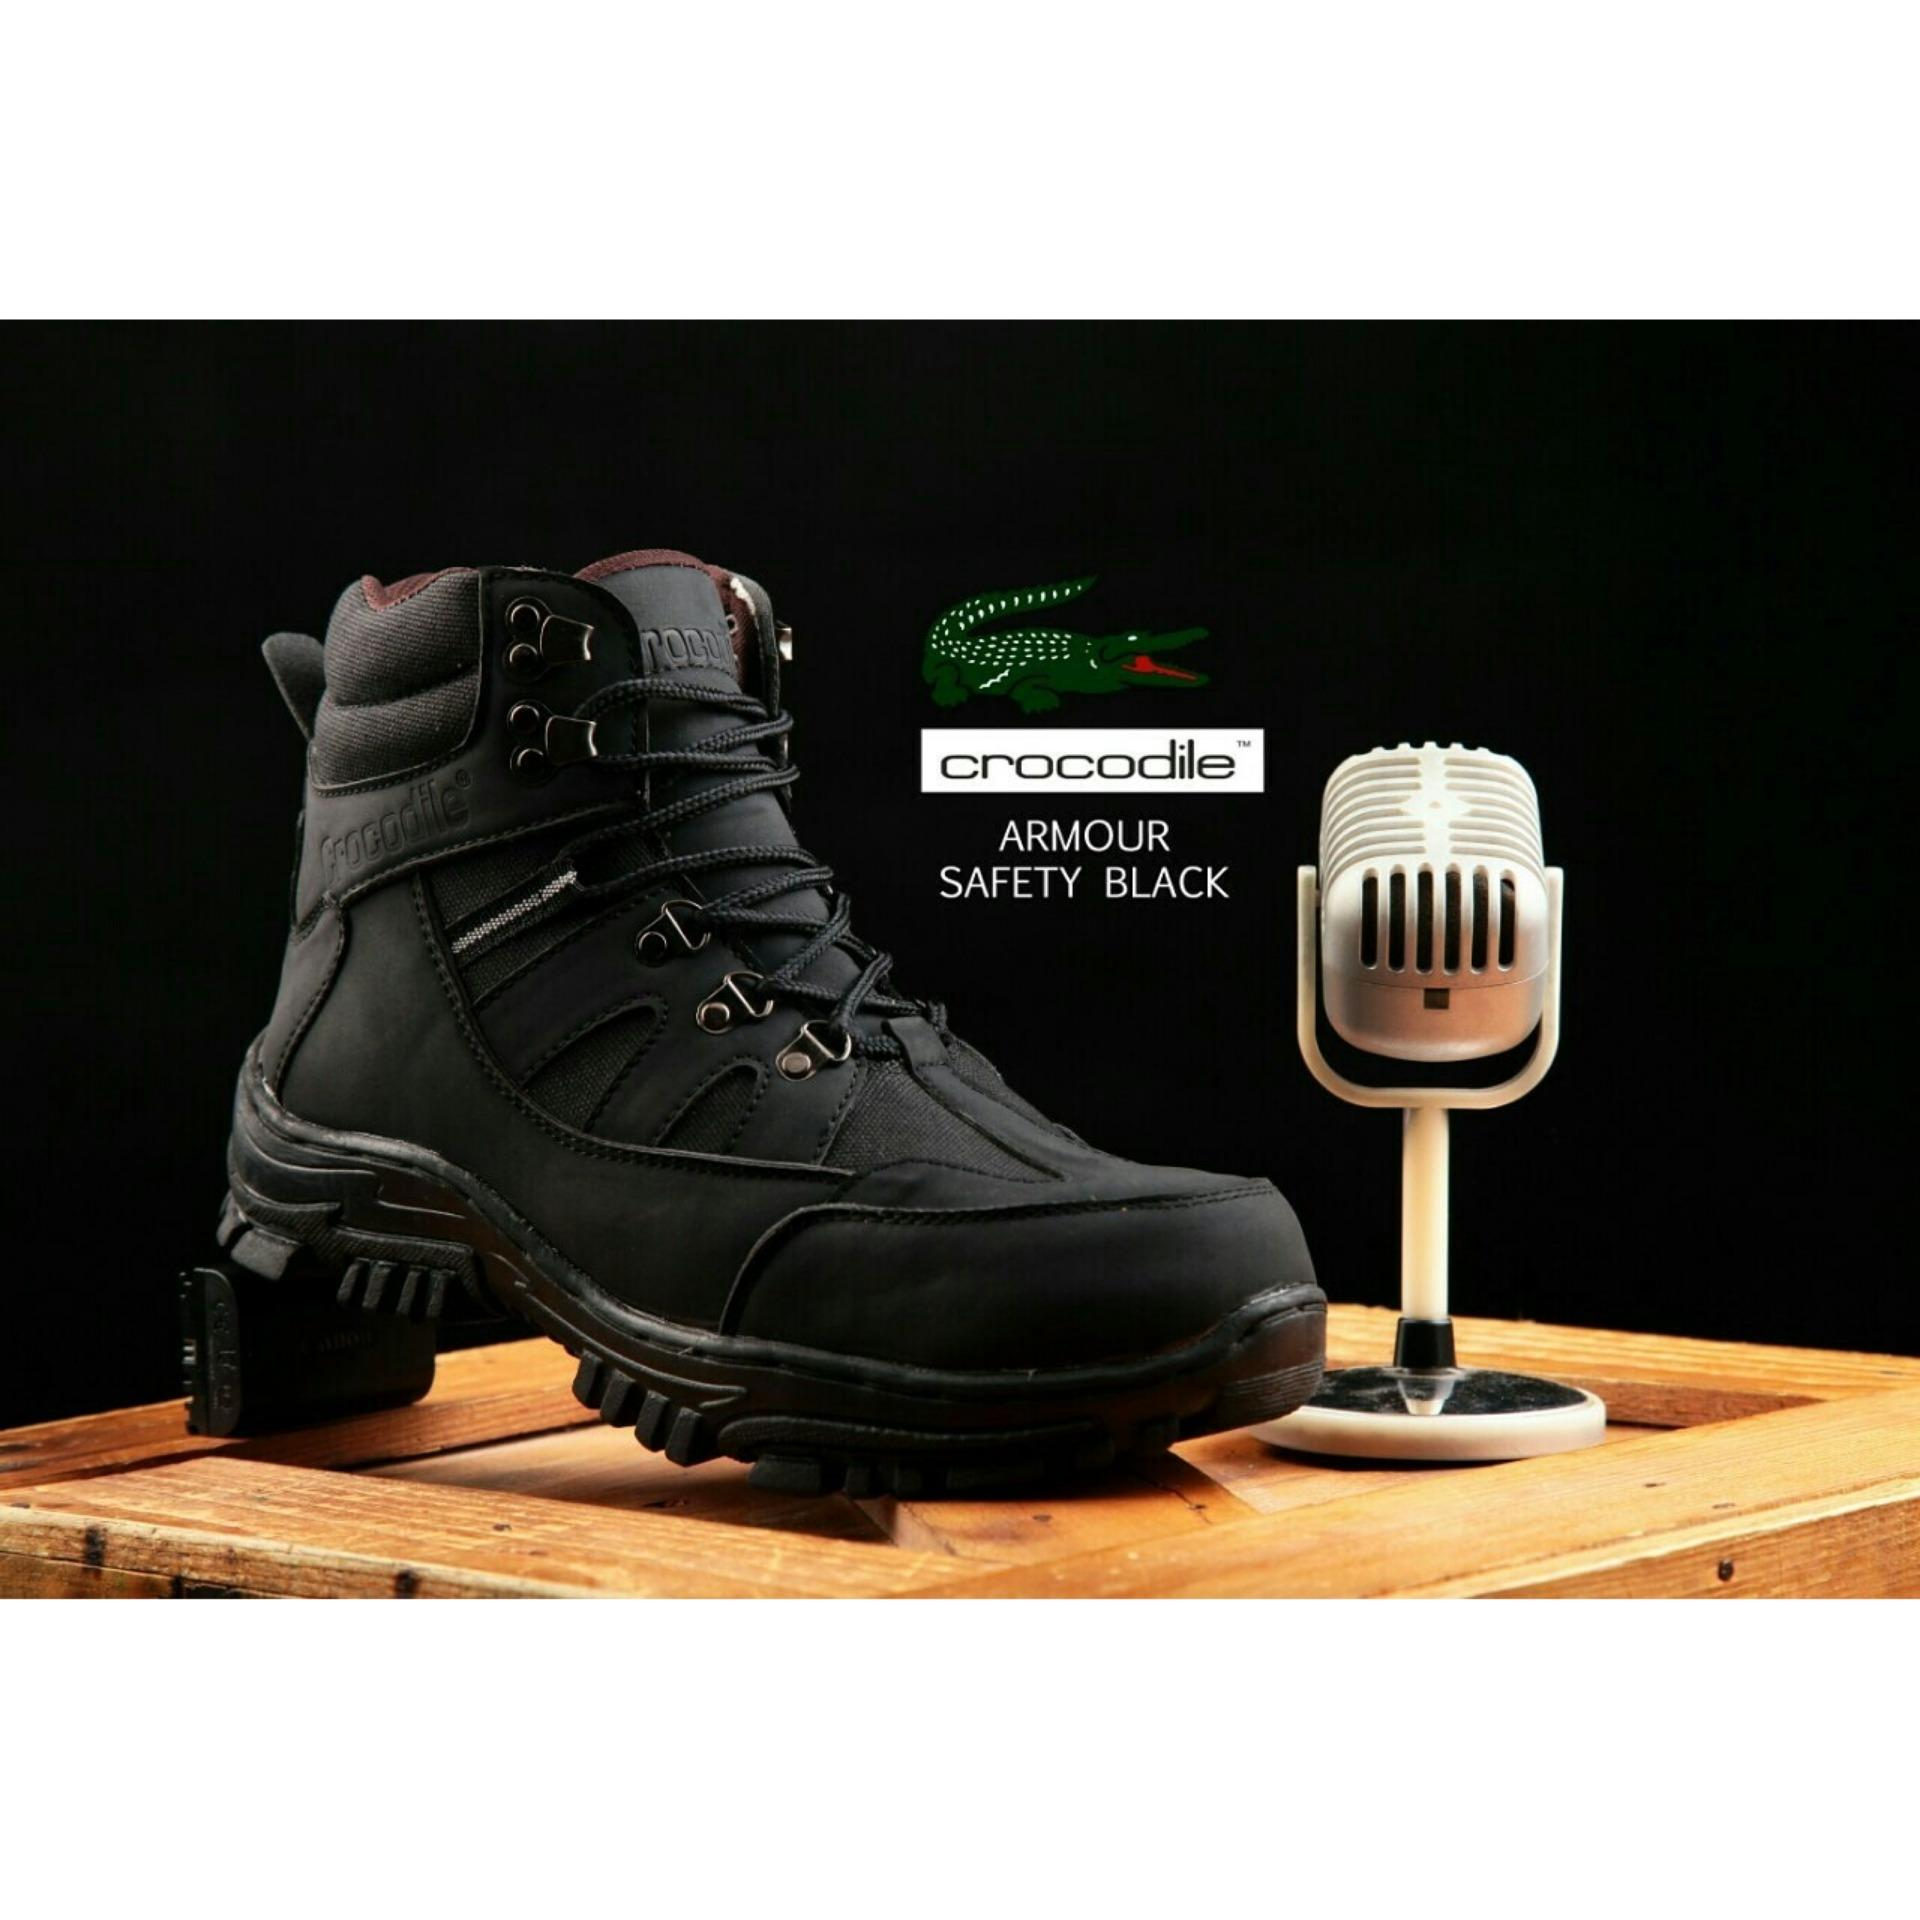 sepatu Boots pria Crocodile armor safety black